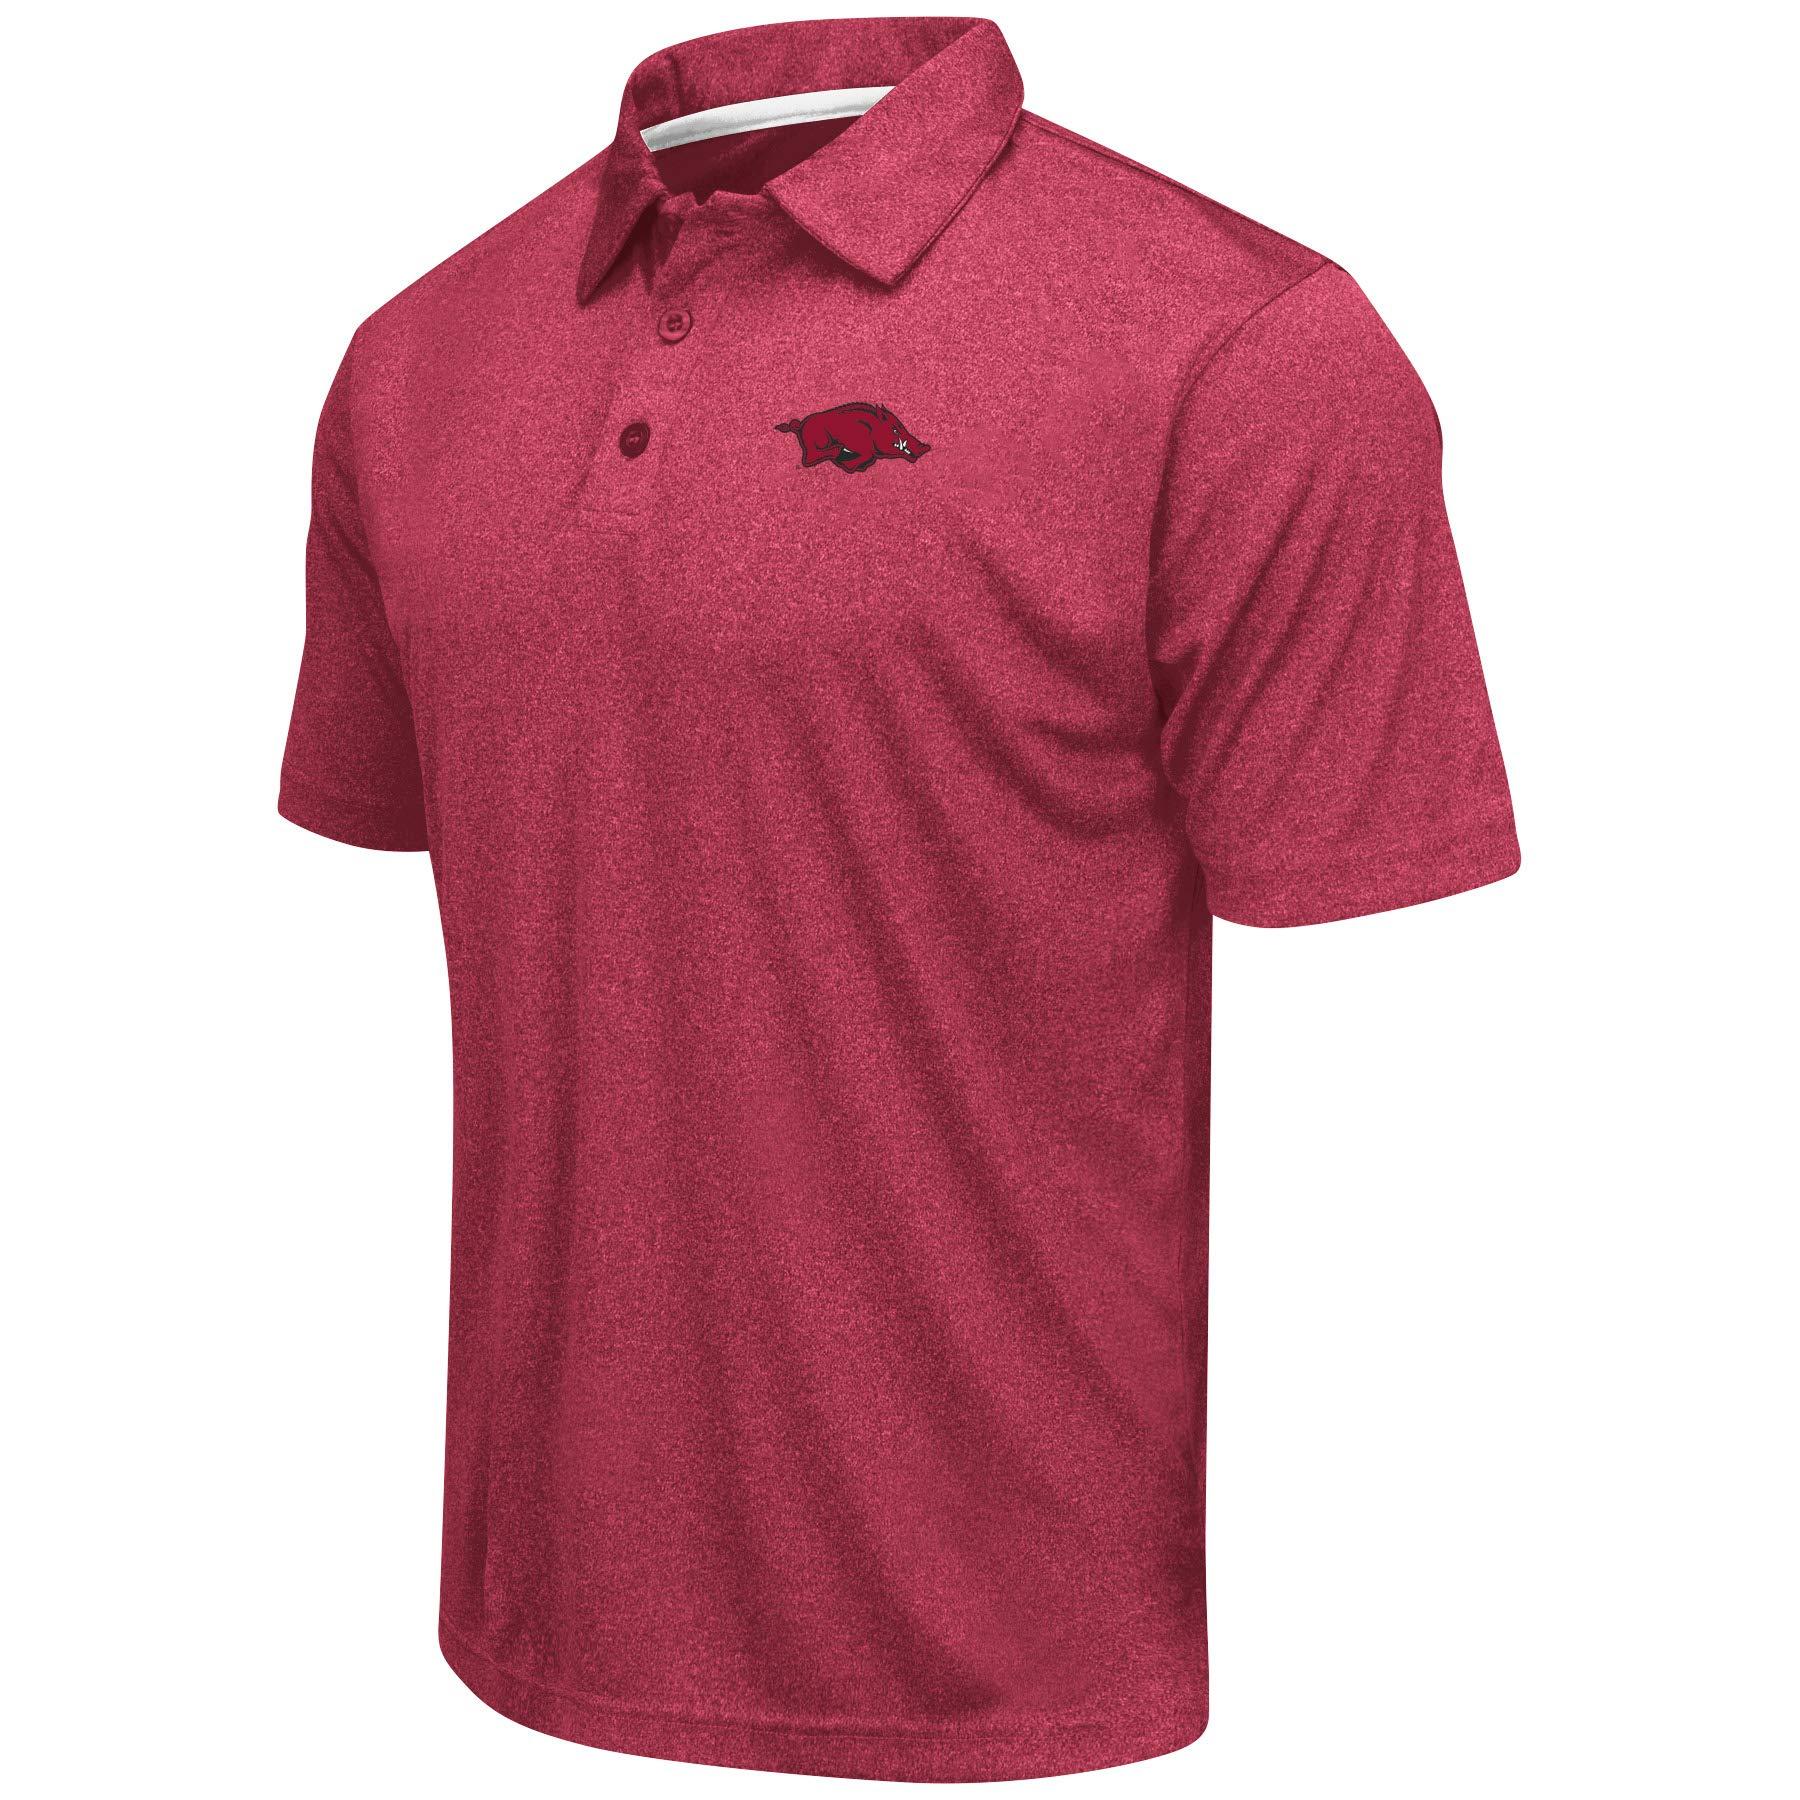 Colosseum Men's NCAA Heathered Trend-Setter Golf/Polo Shirt (Arkansas Razorbacks-Heathered Red, Large)